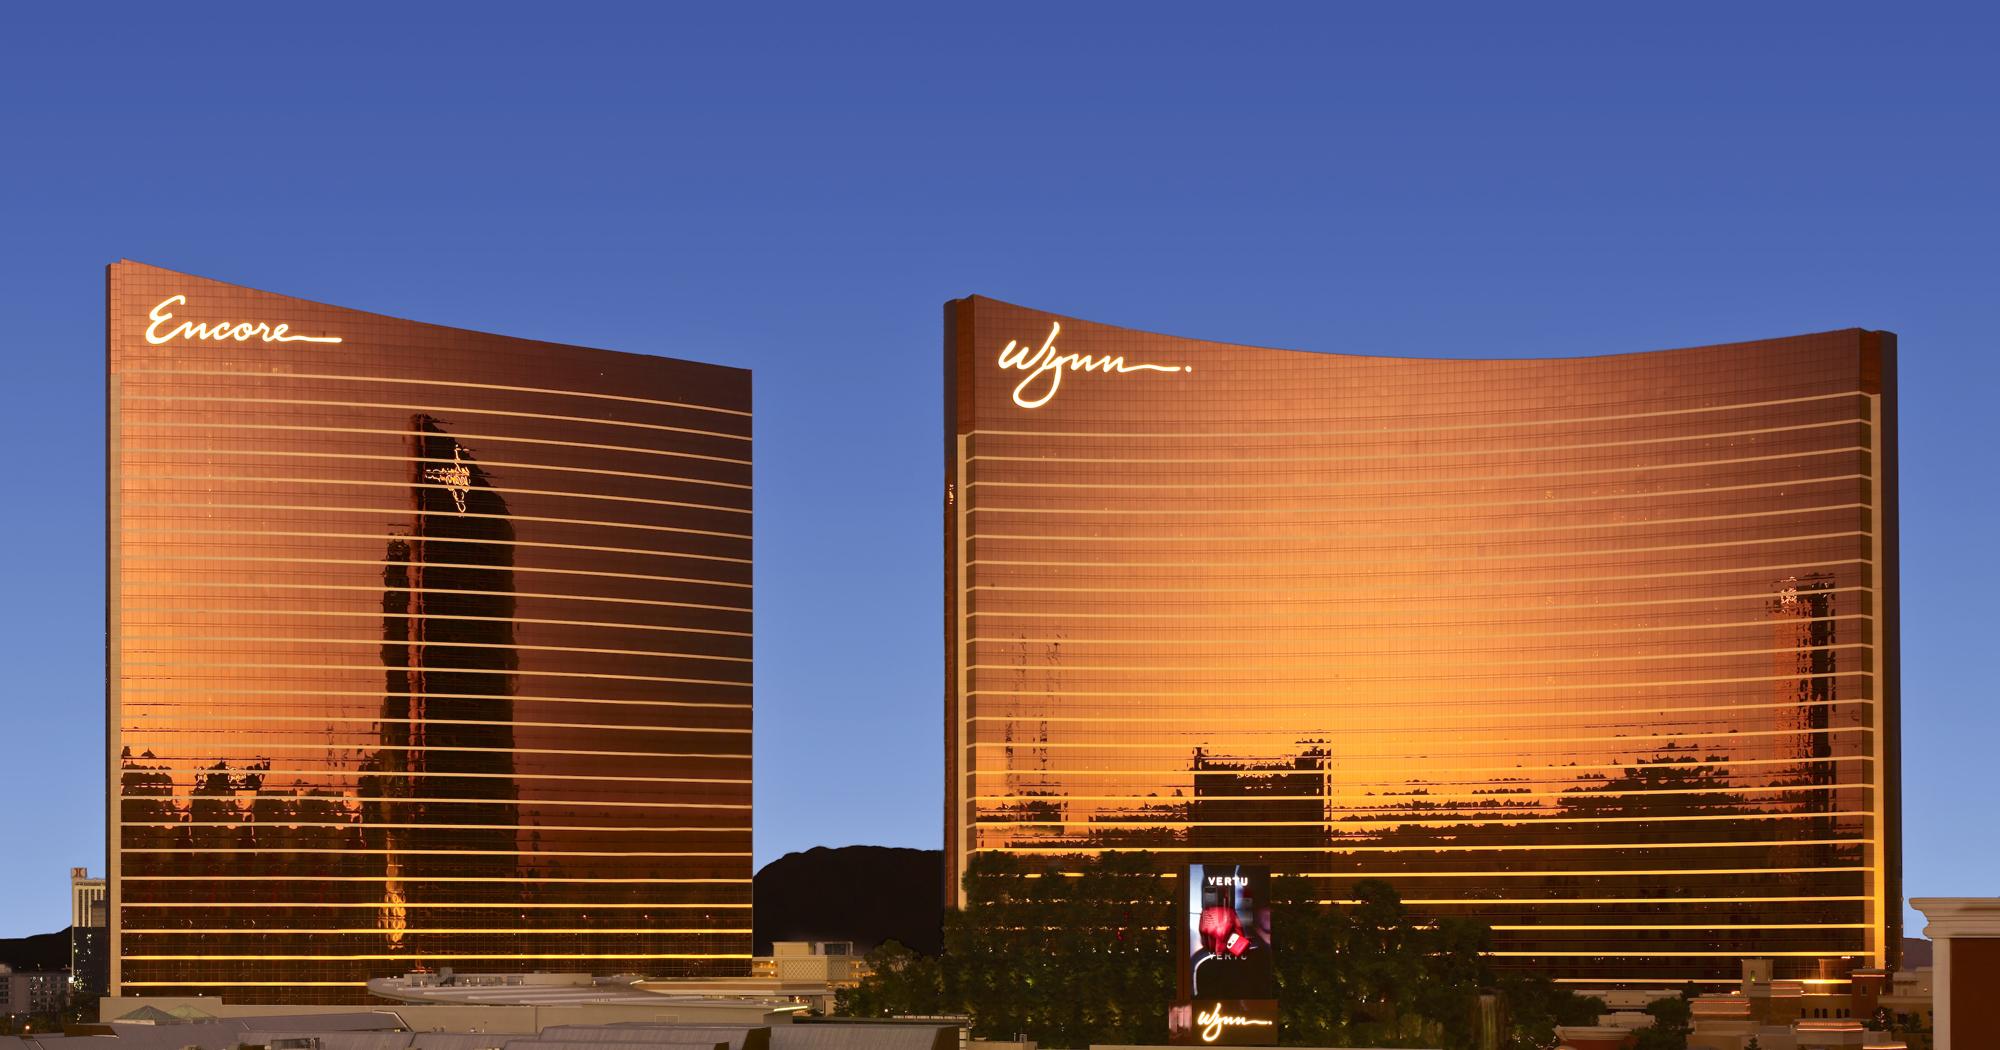 The Wynn Vegas